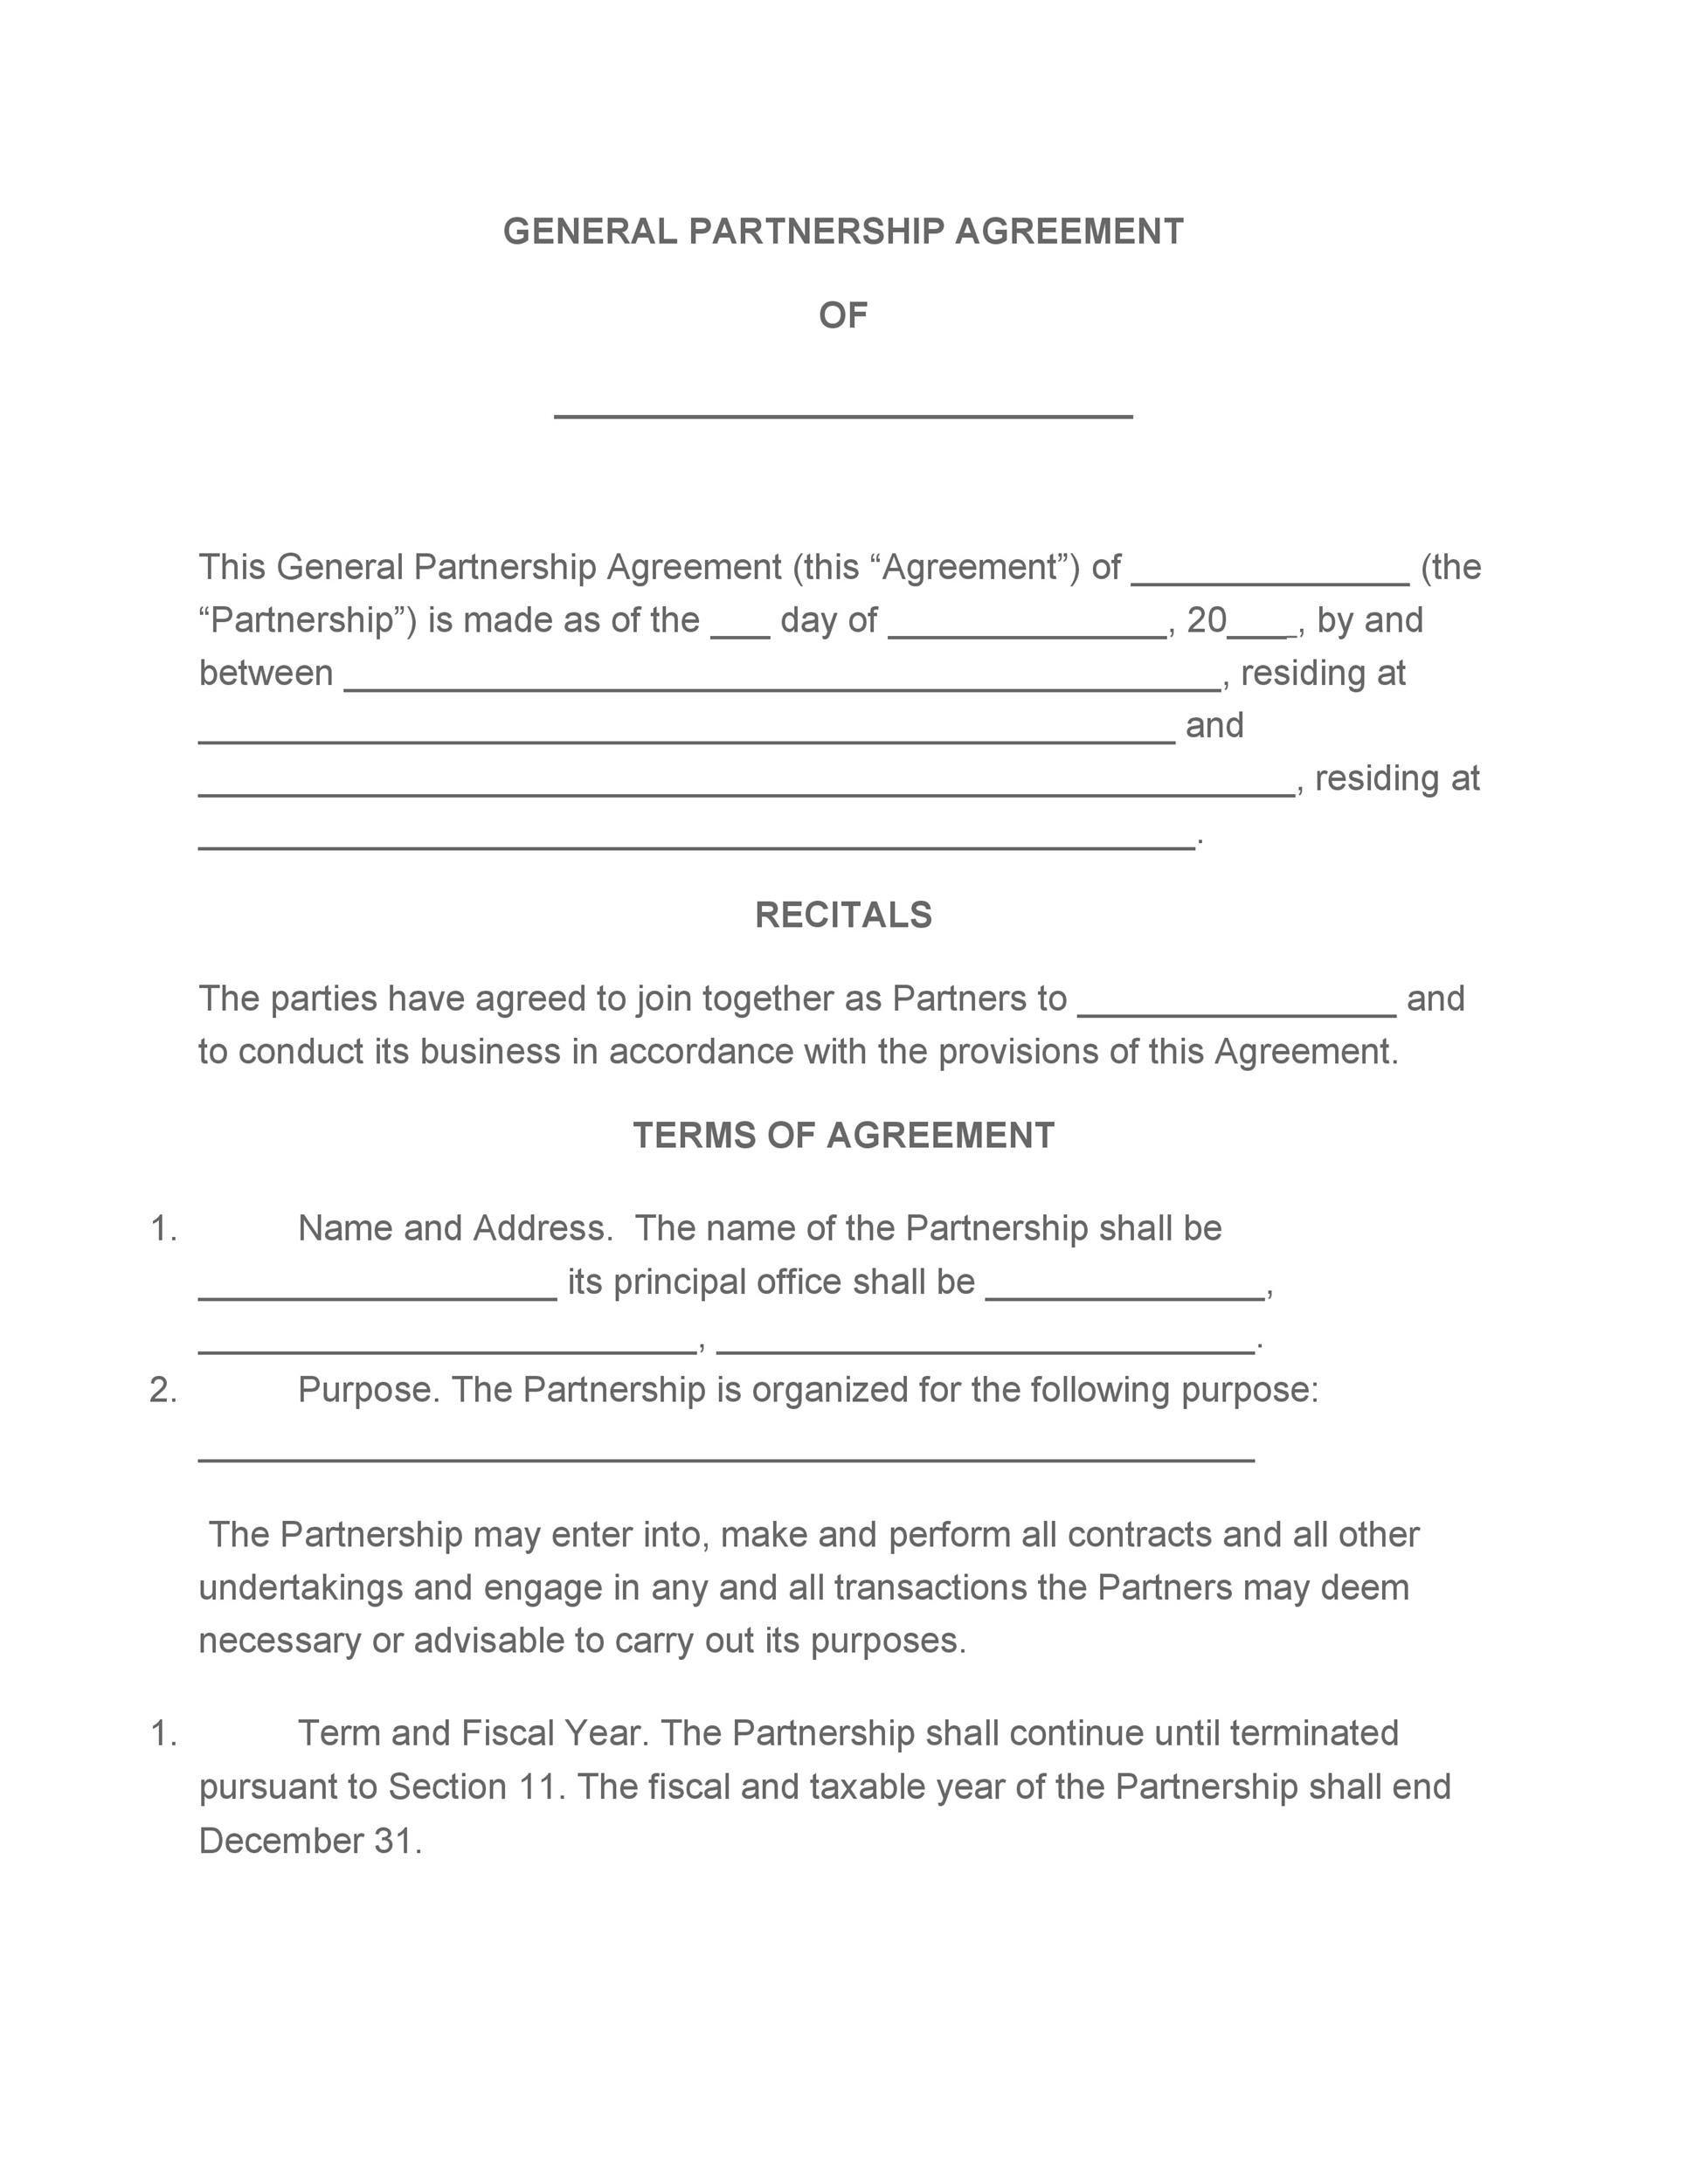 007 Impressive General Partnership Agreement Template High Definition  Word Canada Sample FreeFull